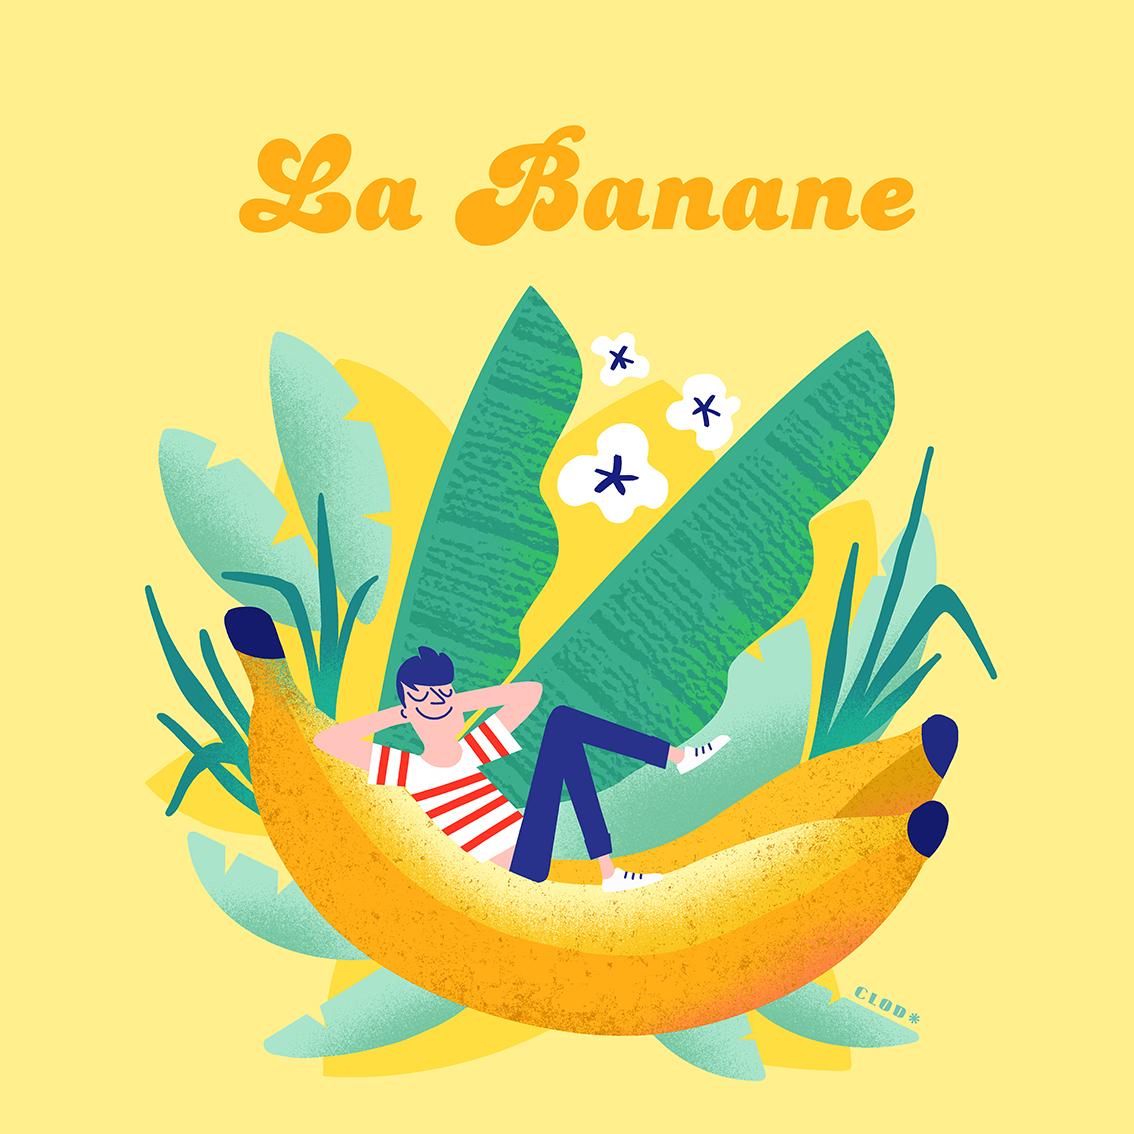 Clod illustration, la banane